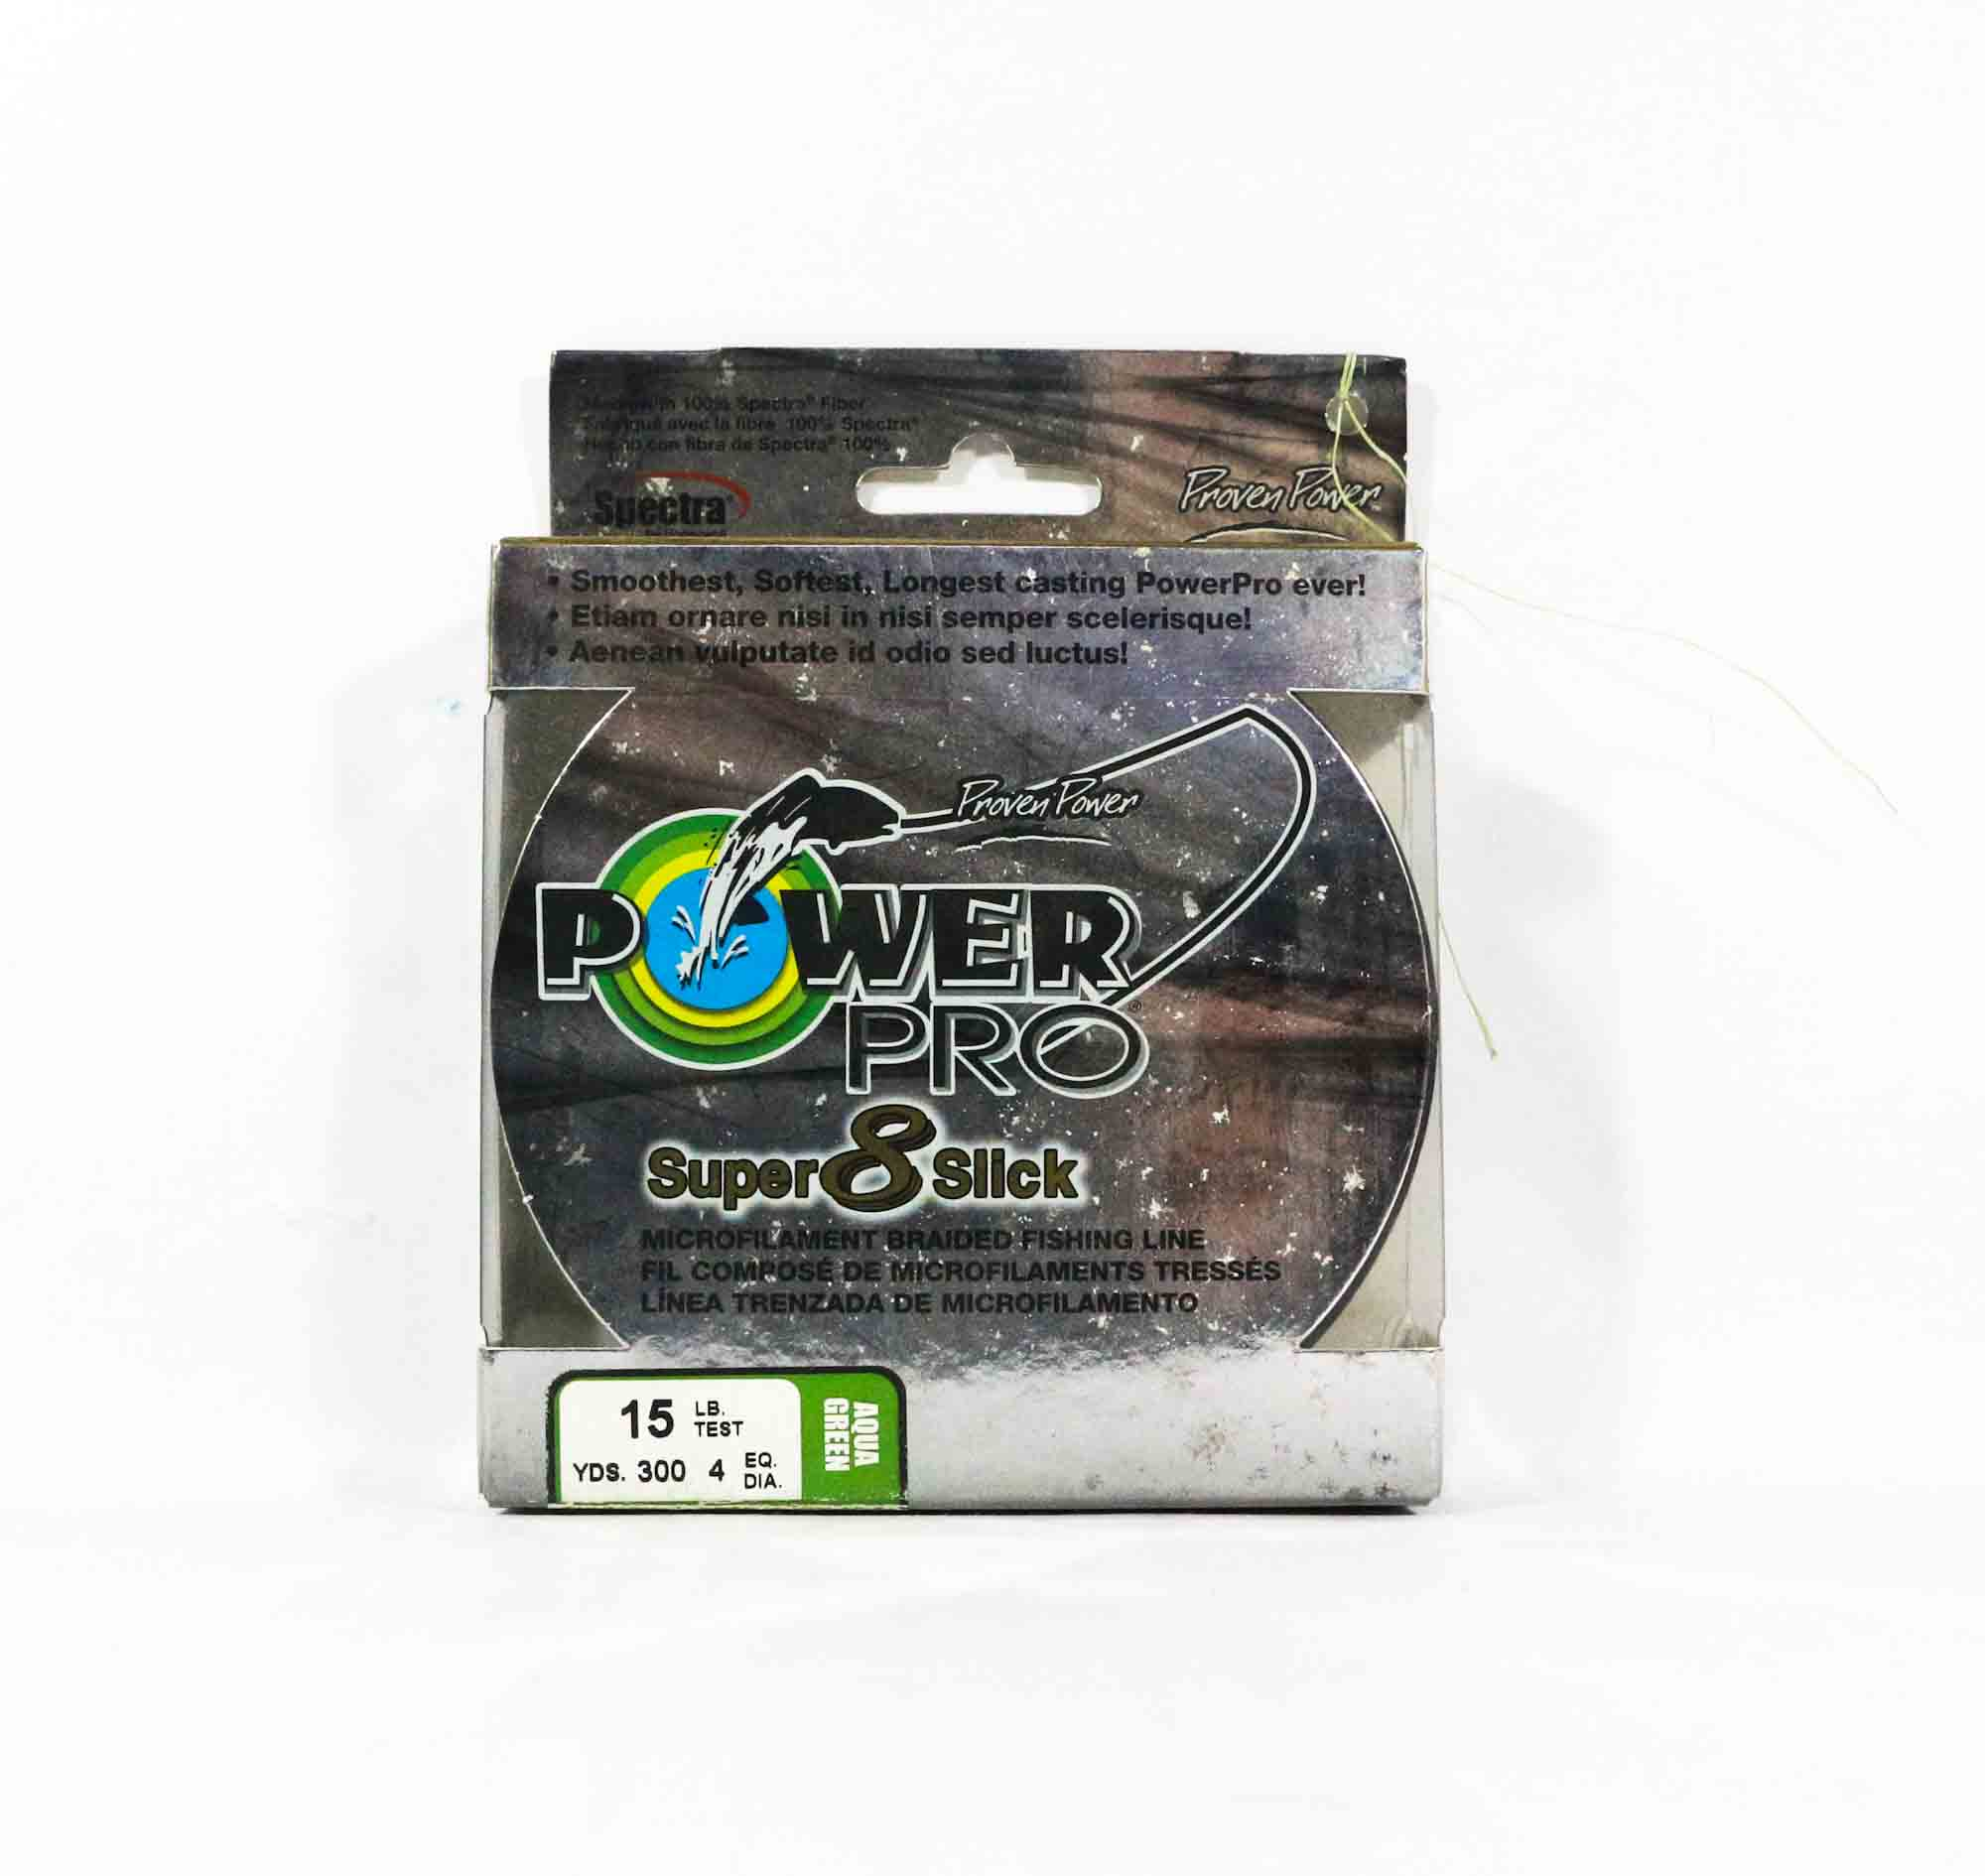 Power Pro Super 8 Slick Spectra Line 15lb by 300yds Green (0701)